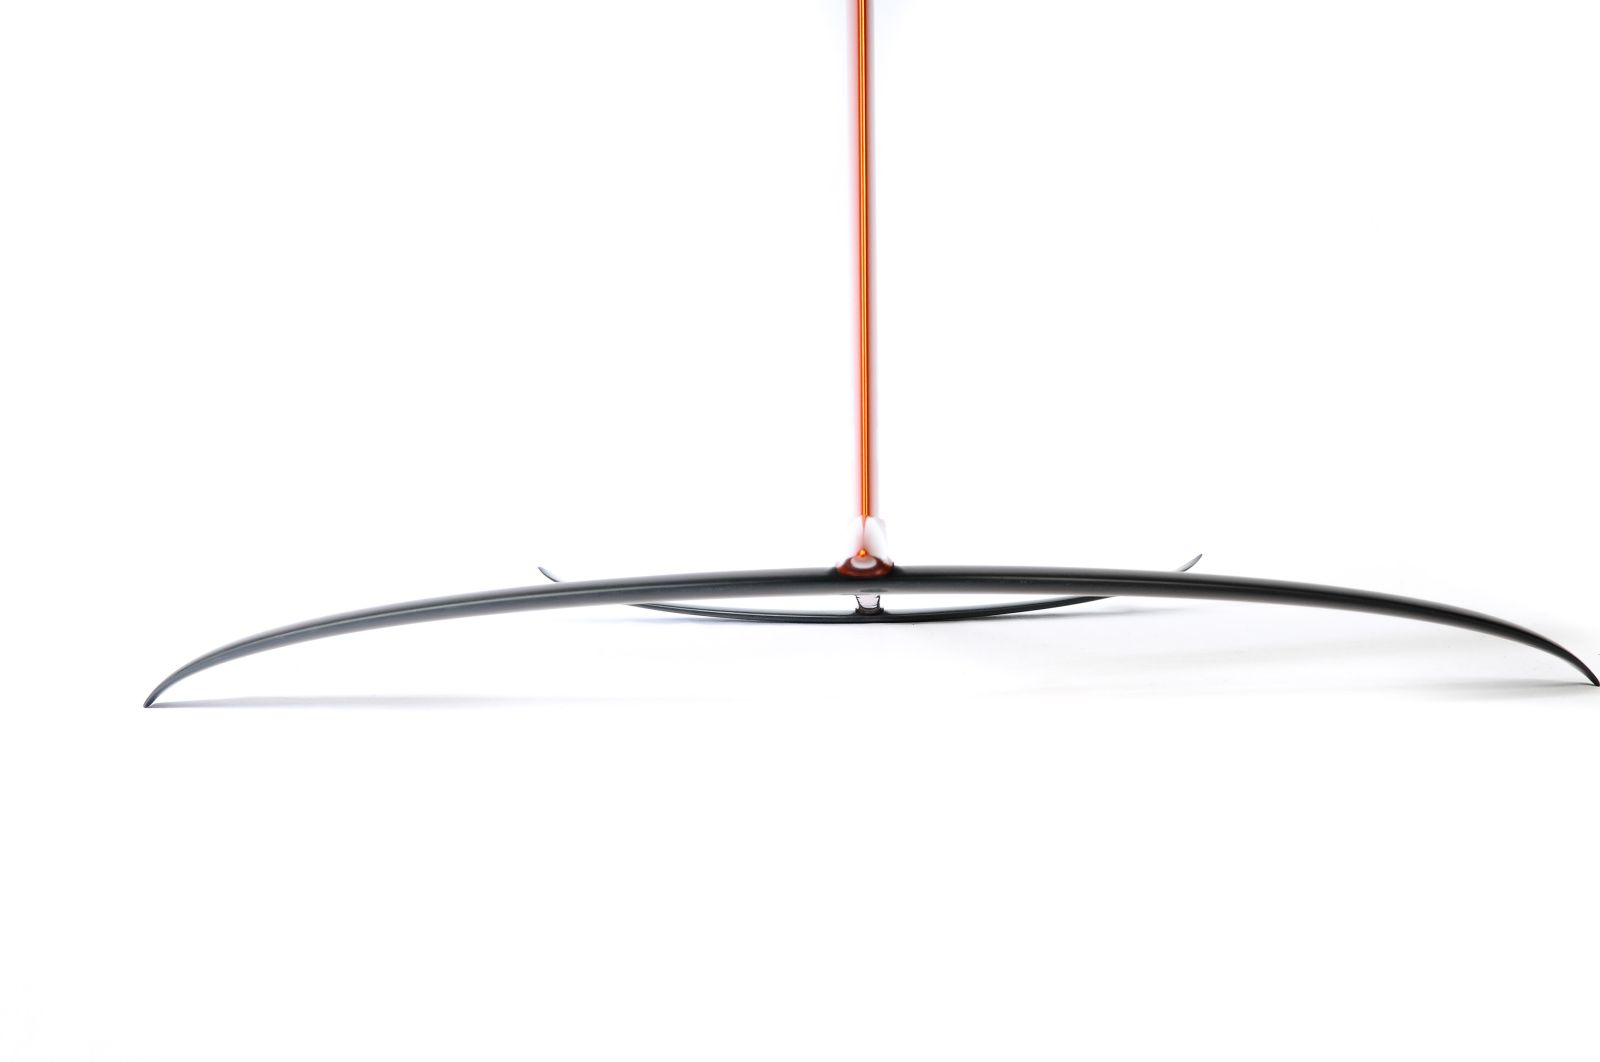 Kitefoil carbon aluminium alpinefoil 5 0 access v2 2702 1